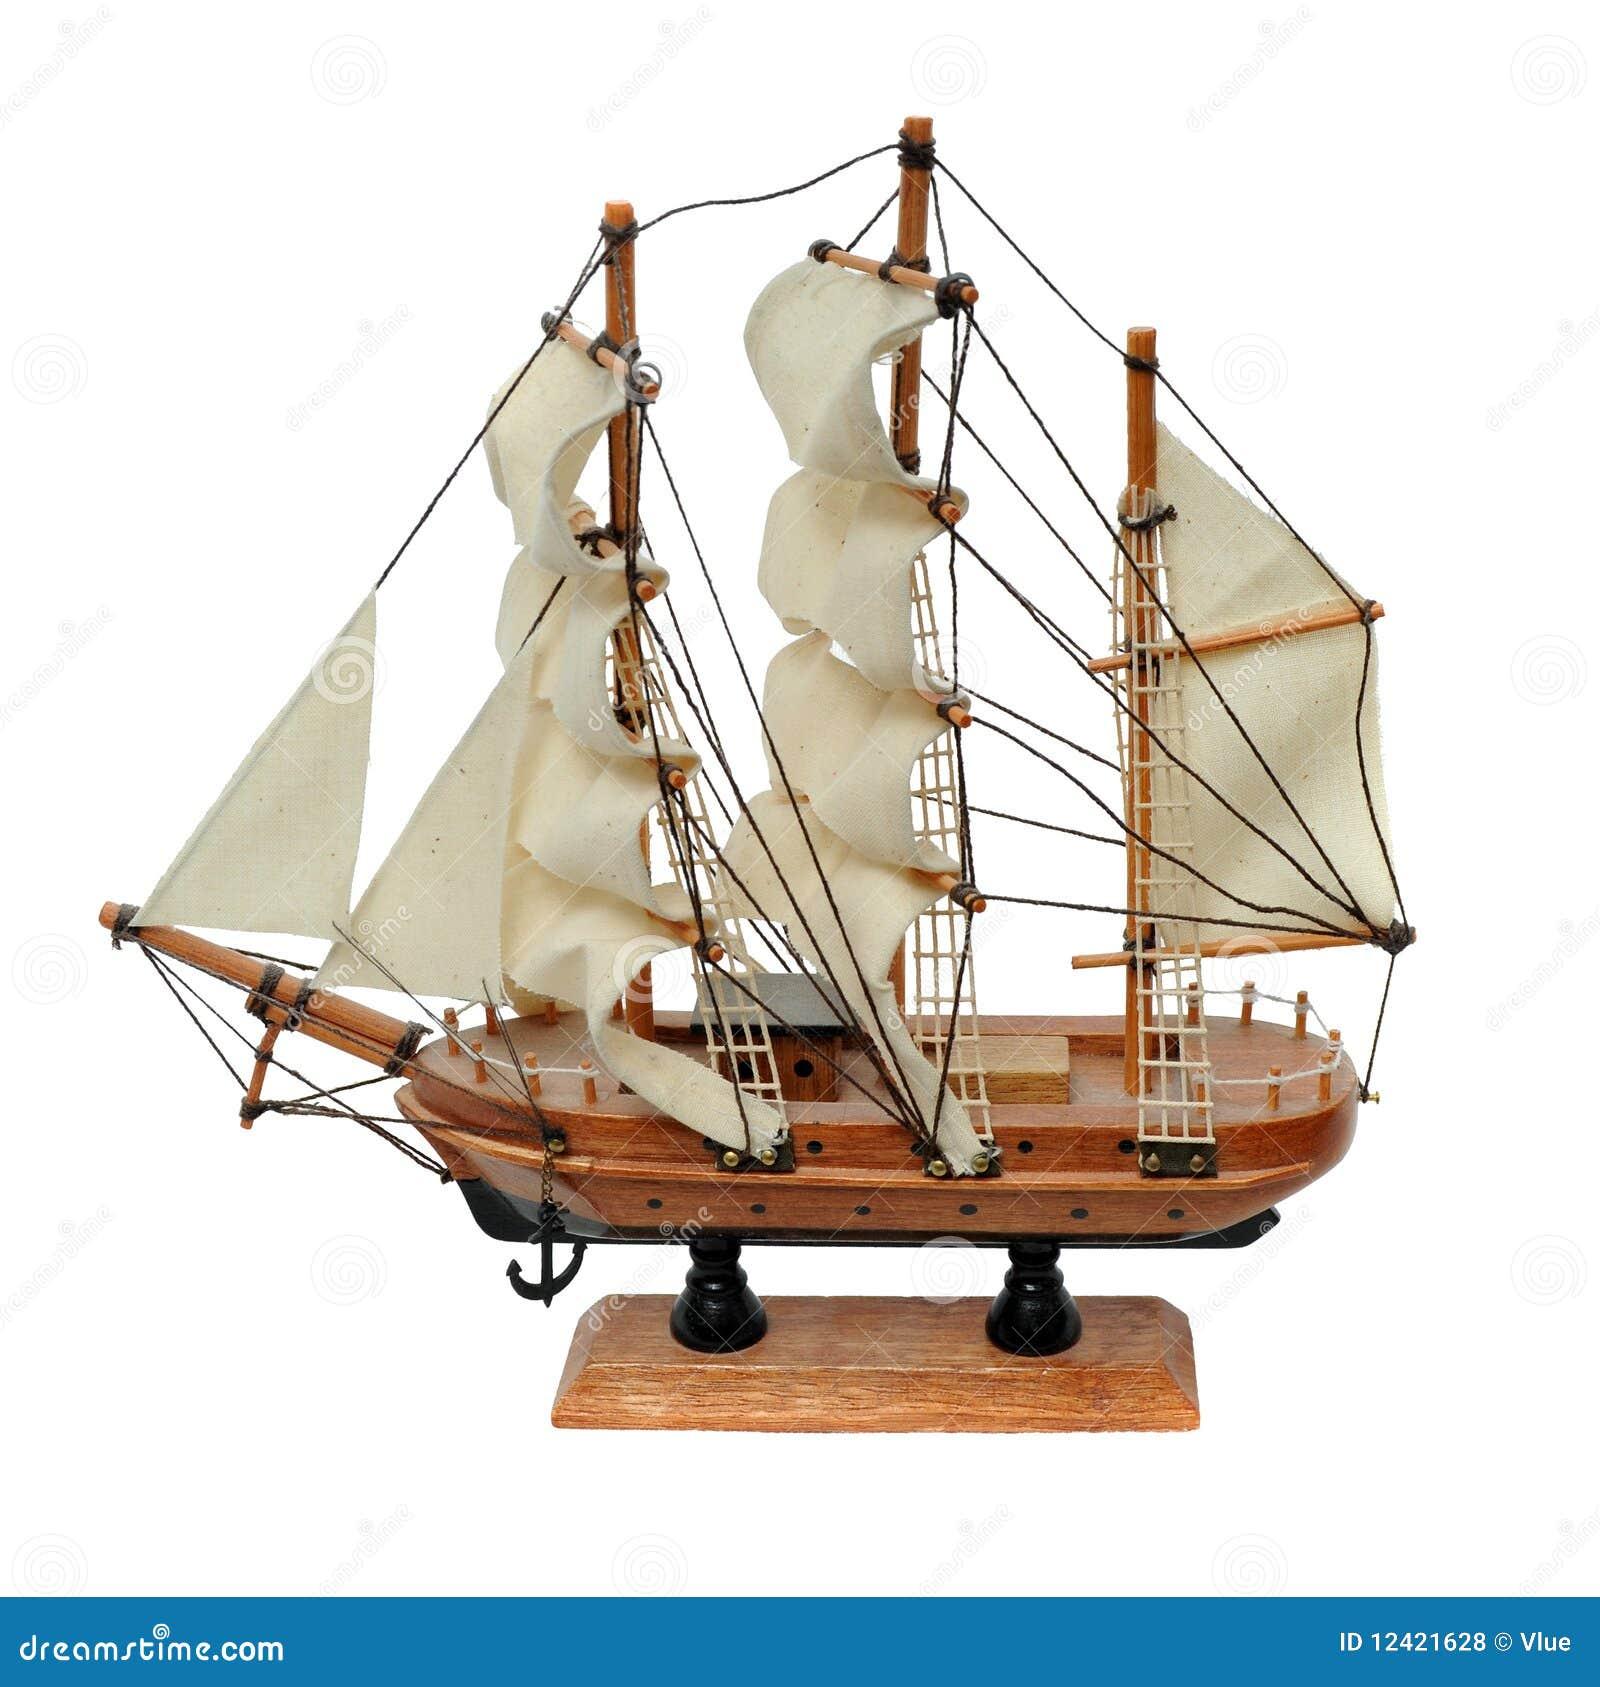 Miniature ship model stock photo. Image of explore, pirate ...